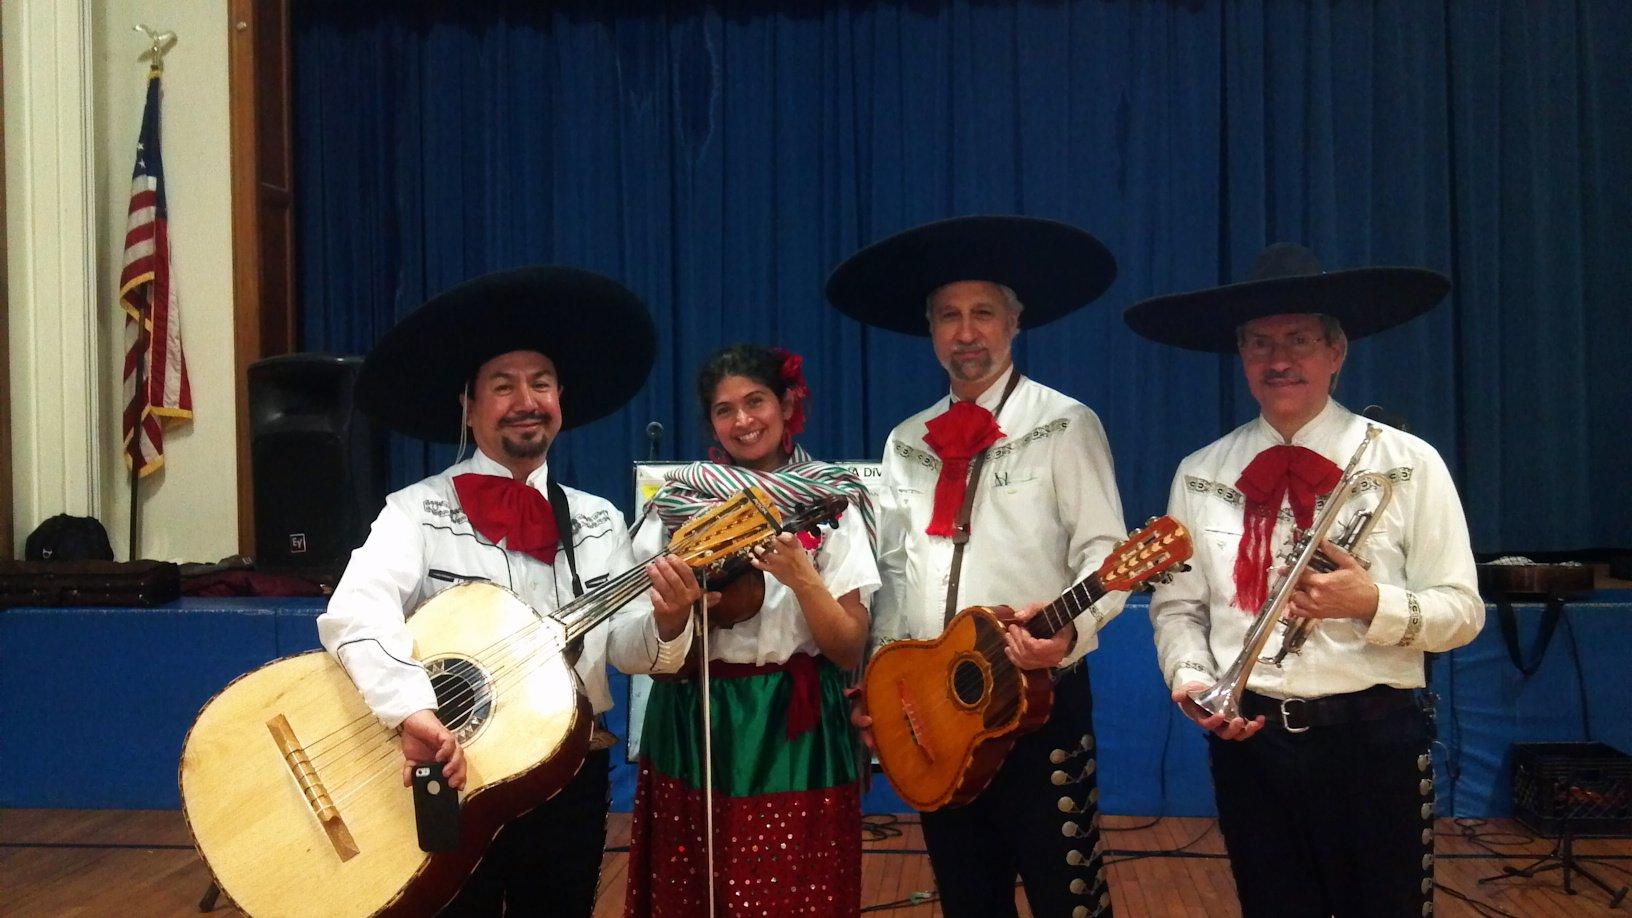 Fiesta del Norte — Mariachi Band in Connecticut